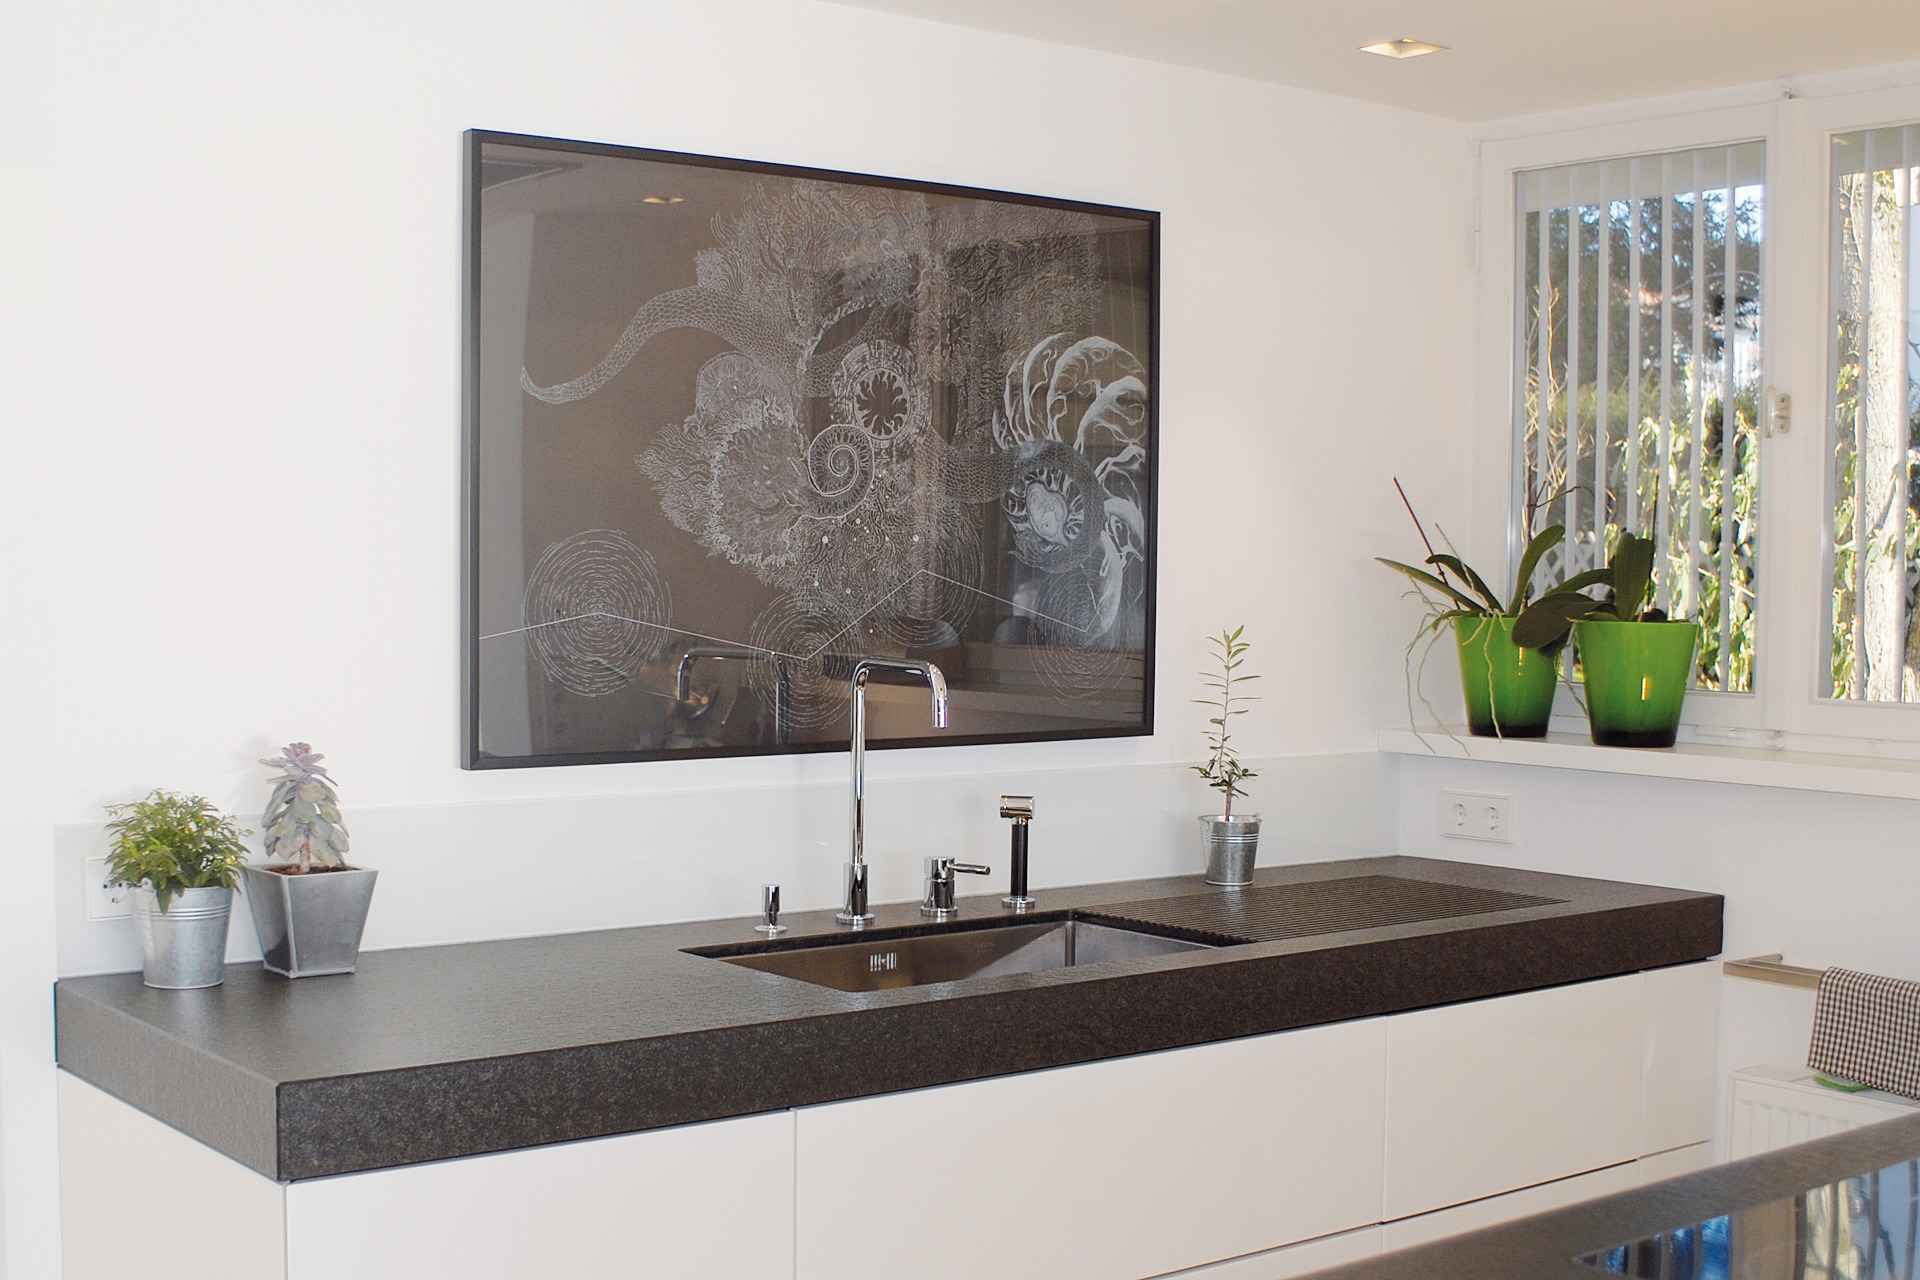 pendelt r k che holz komplette k che mit elektroger ten g nstig kleine tisch fernseher f r ikea. Black Bedroom Furniture Sets. Home Design Ideas